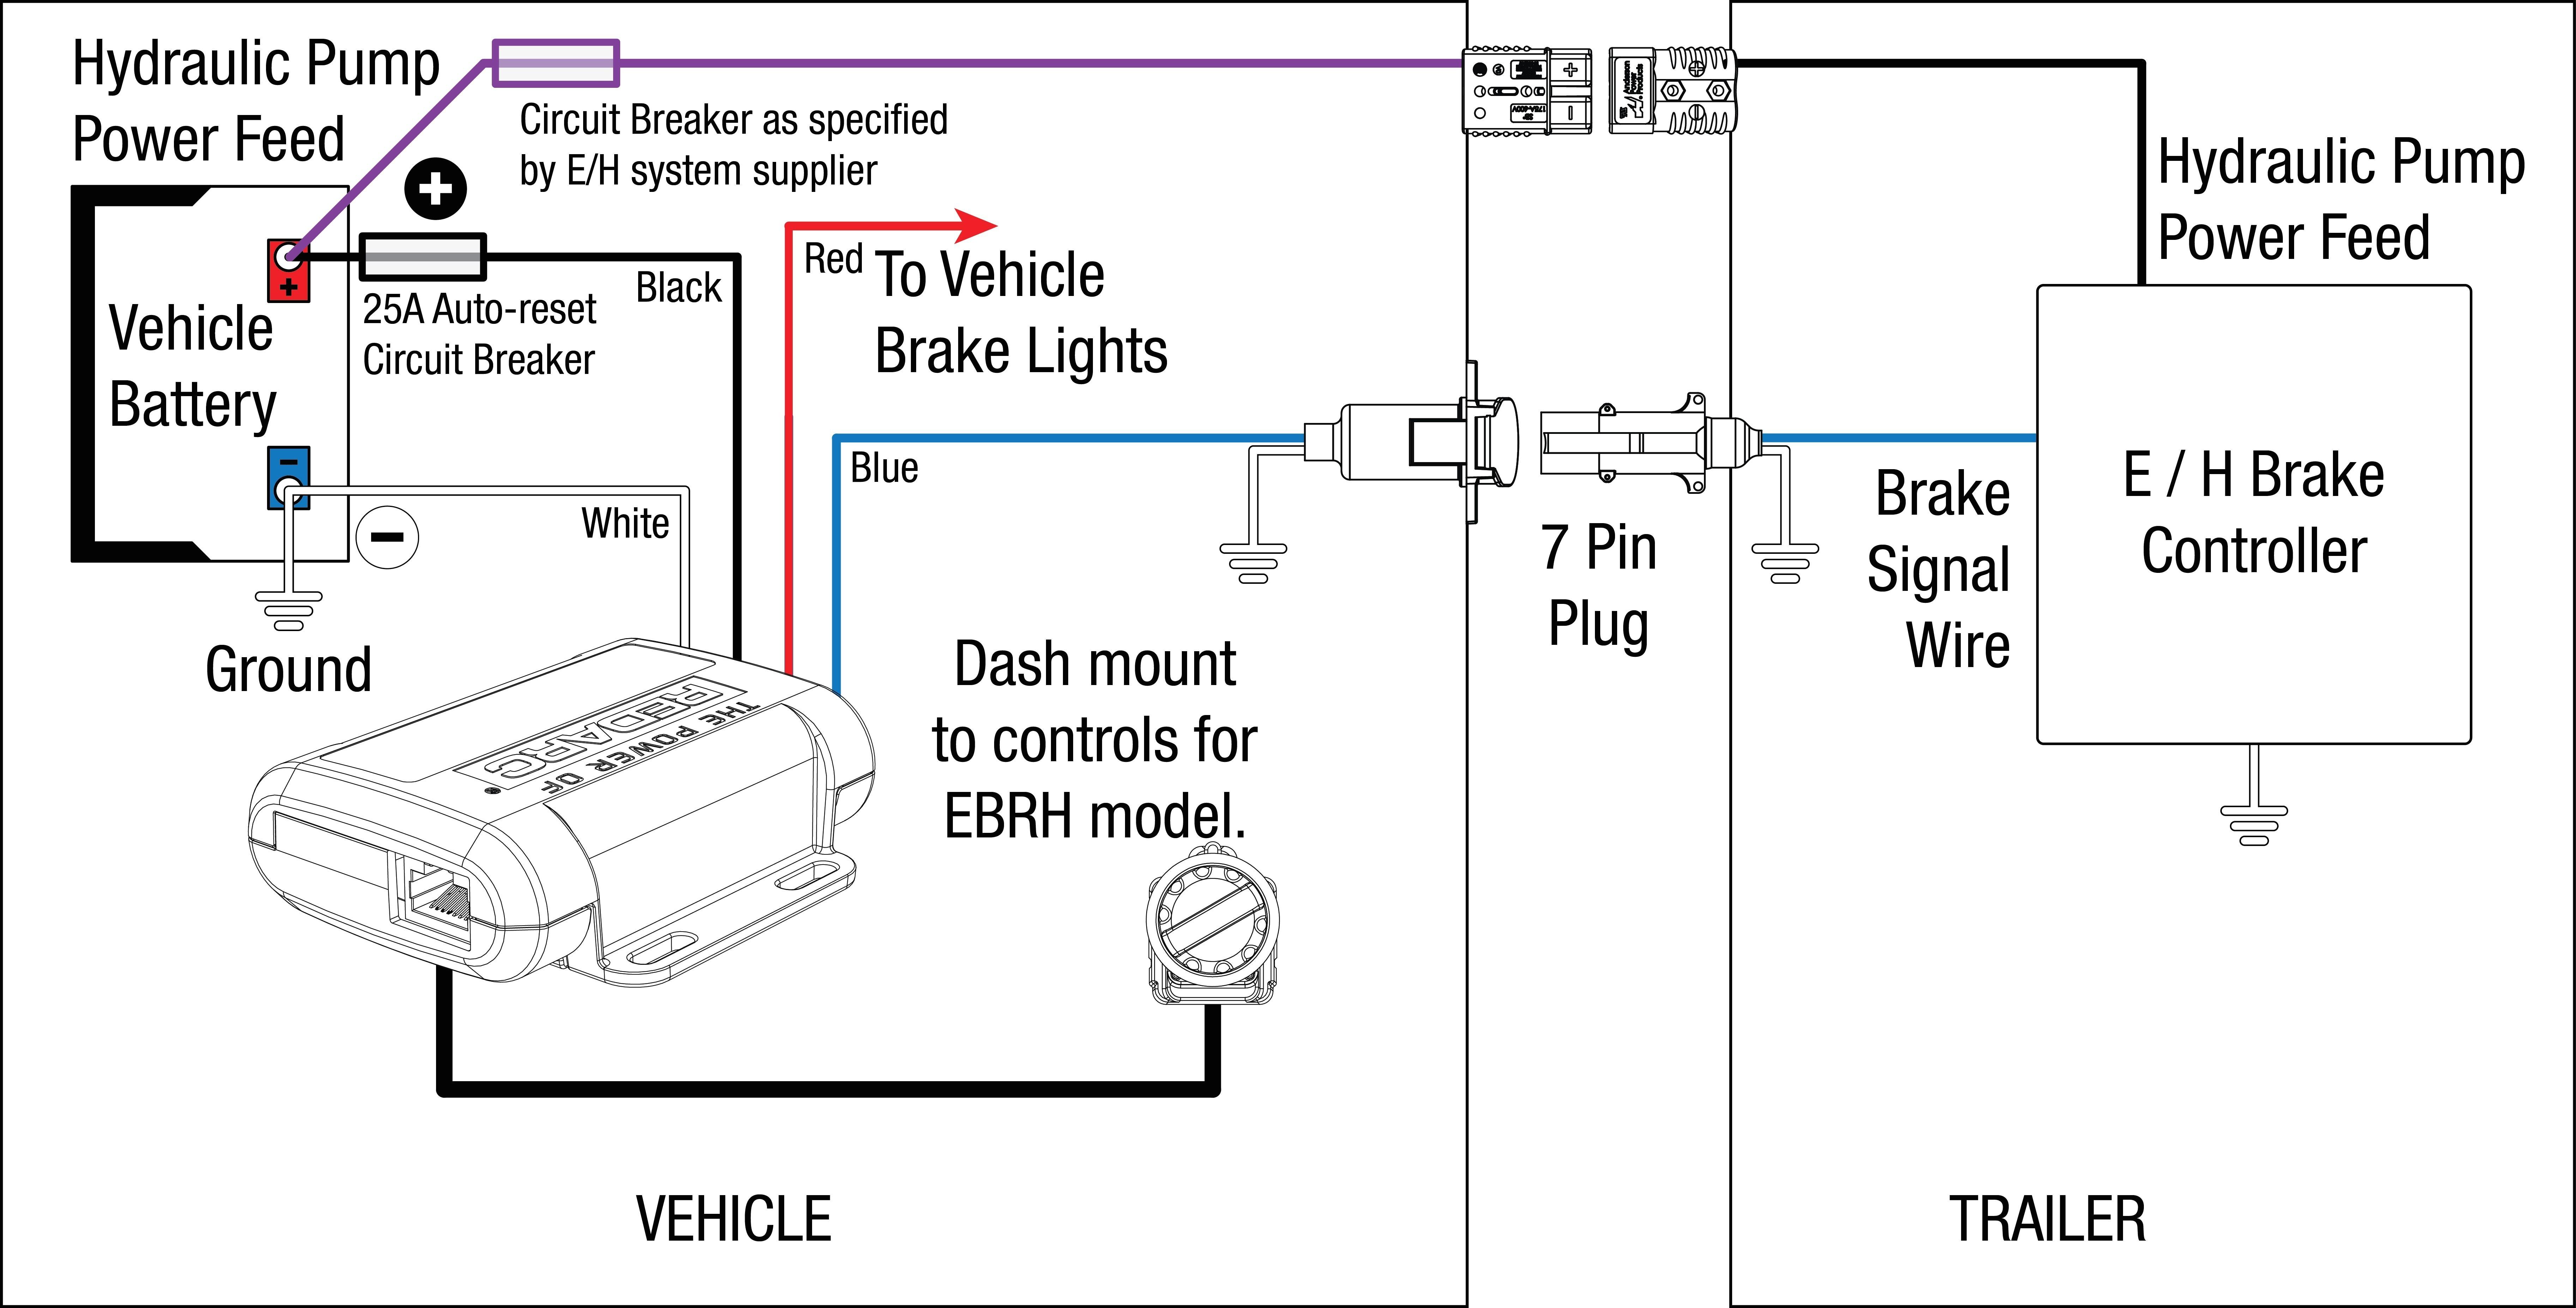 electric brake controller wiring diagram best of wiring diagram image rh mainetreasurechest com prodigy electric brake controller wiring diagram trailer brake controller wiring diagram